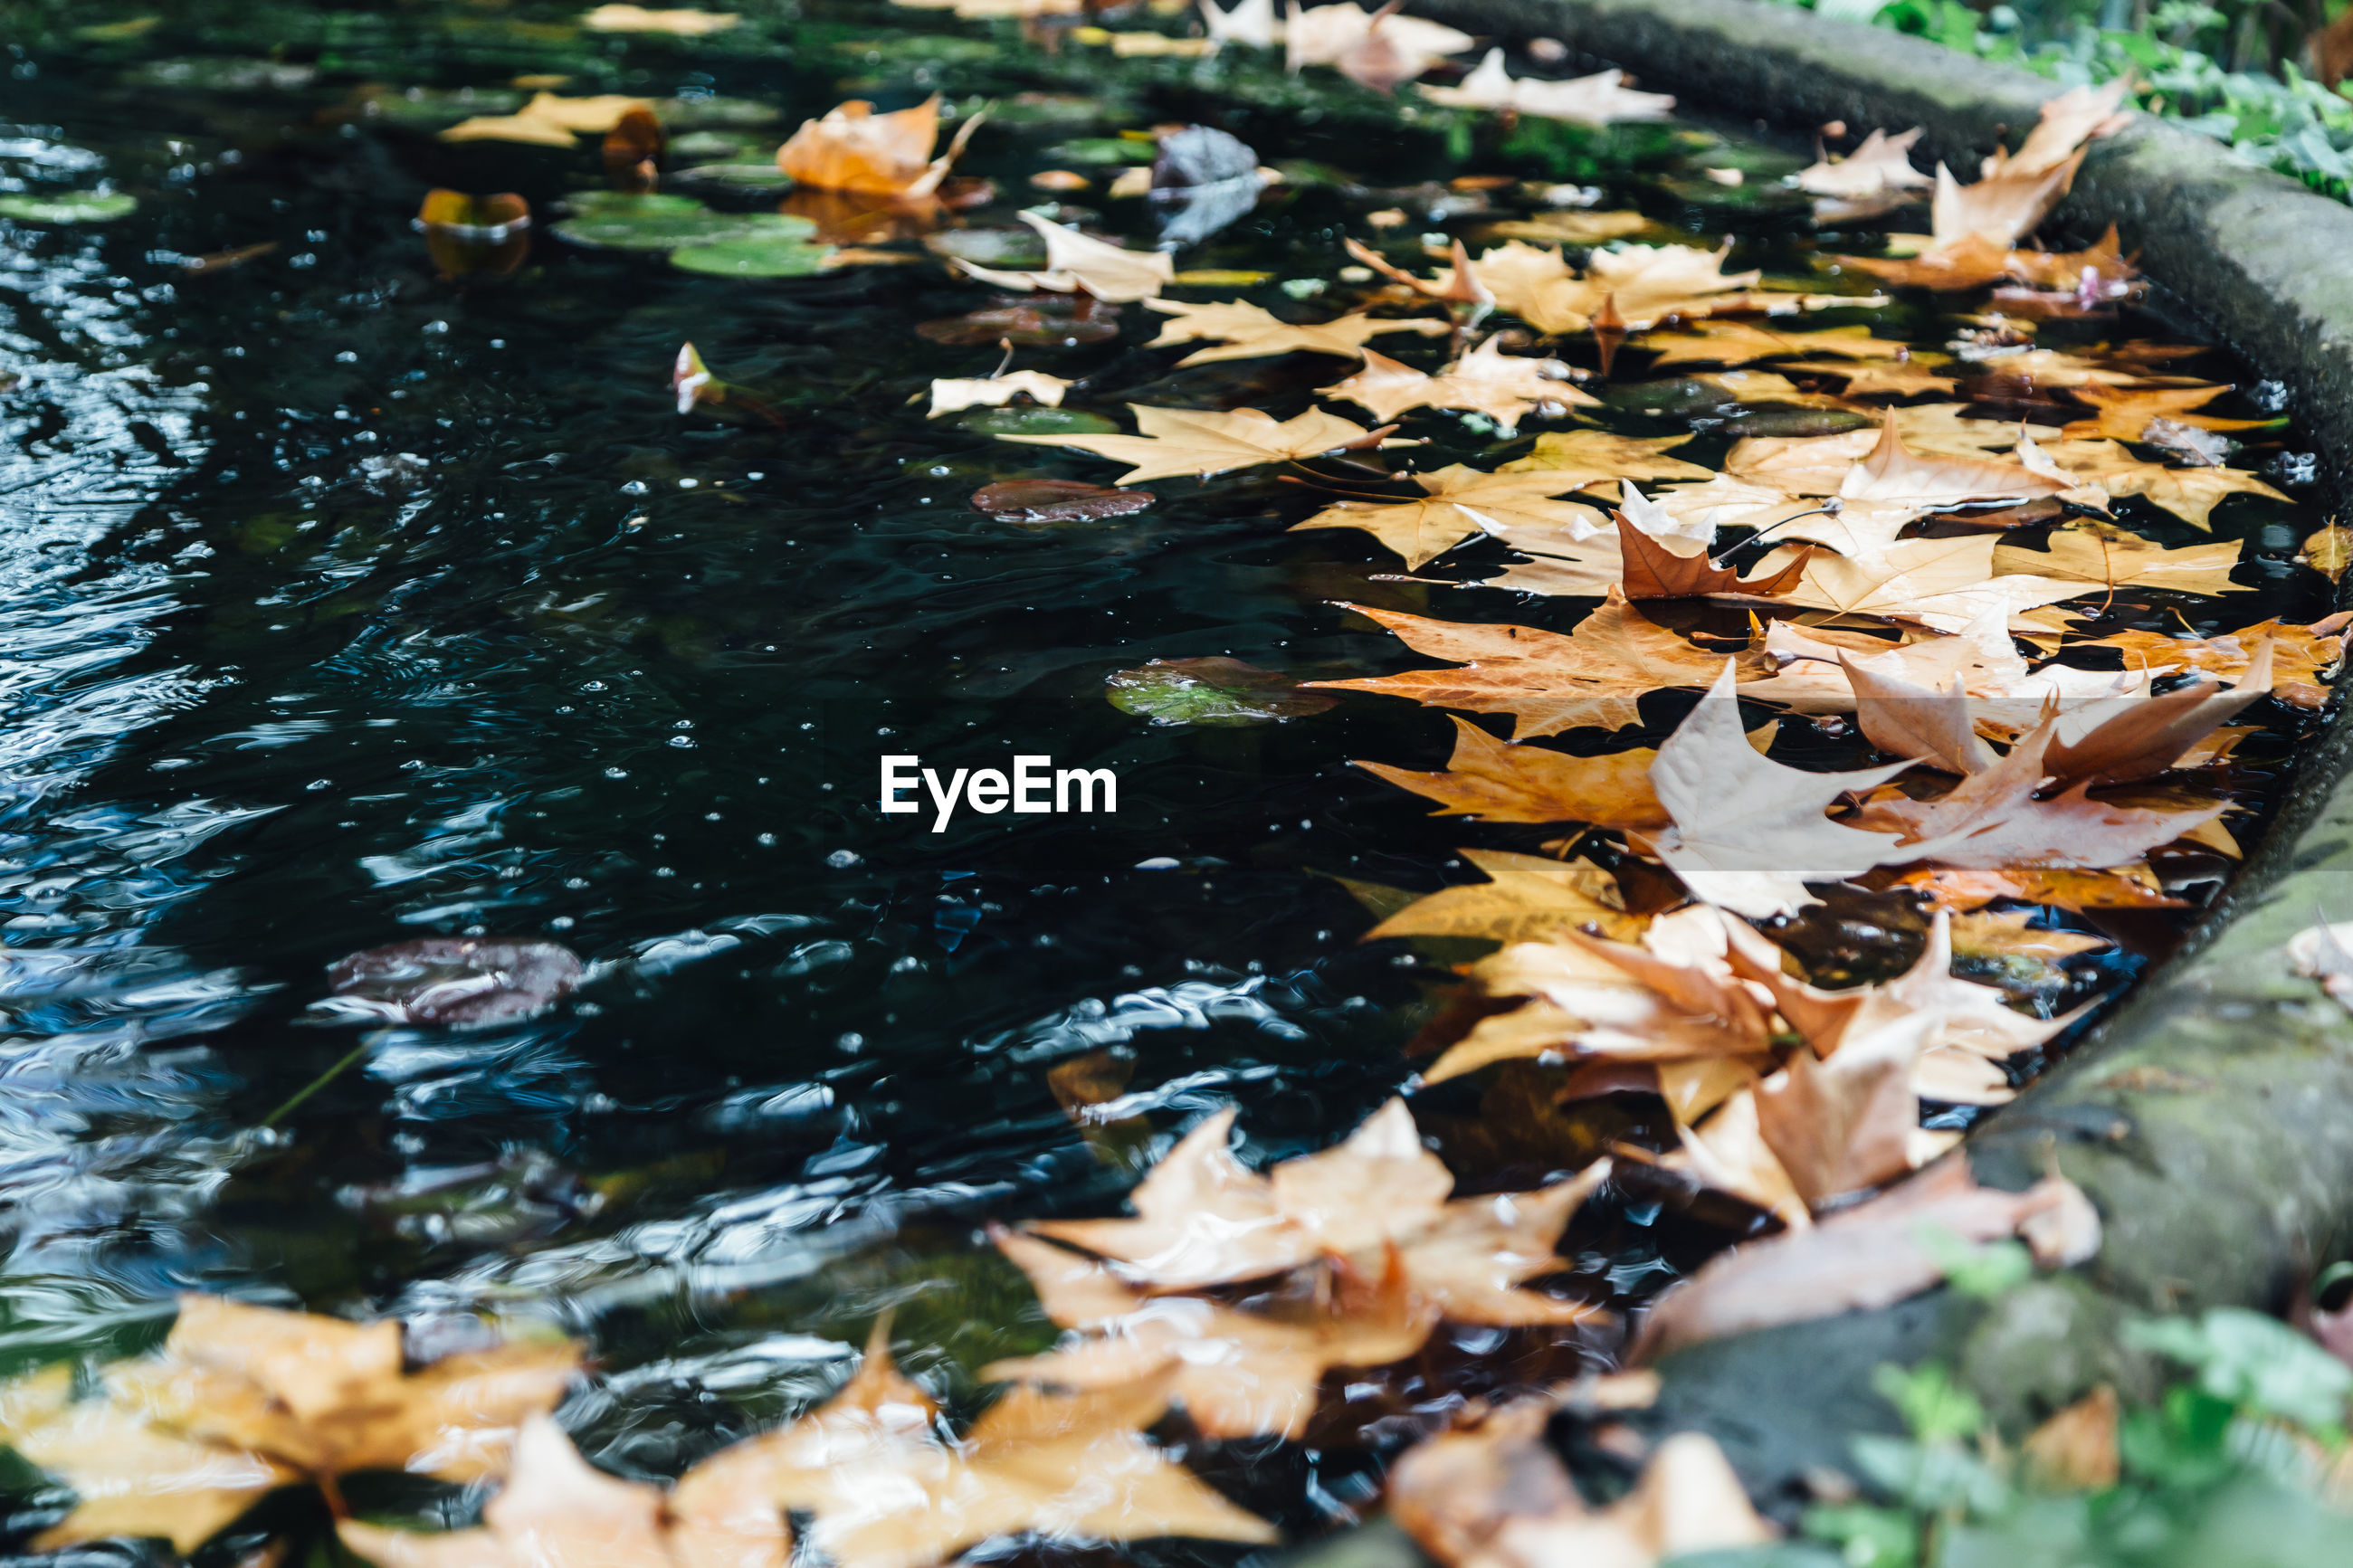 Fallen leaves on ground